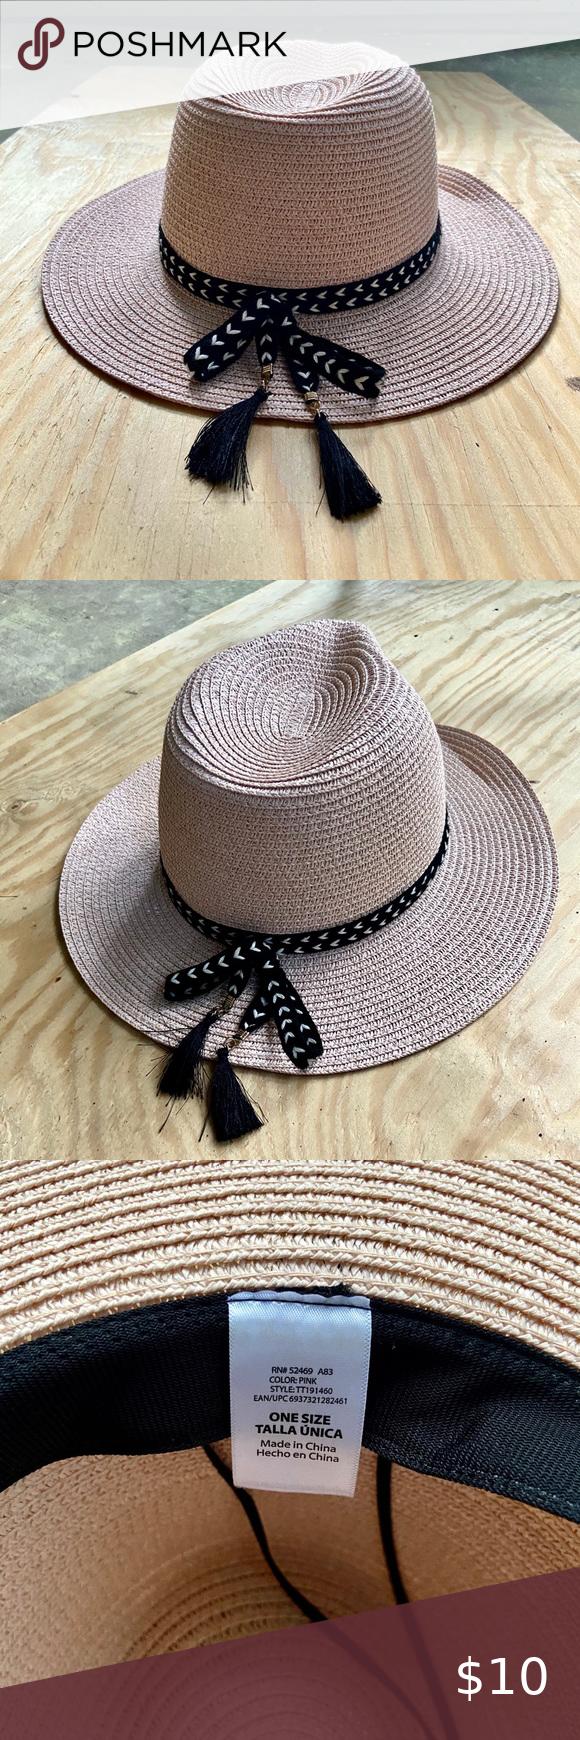 Summer Classic Straw Fedora Sun Hat In 2020 Sun Hats Straw Fedora Floppy Hat Summer